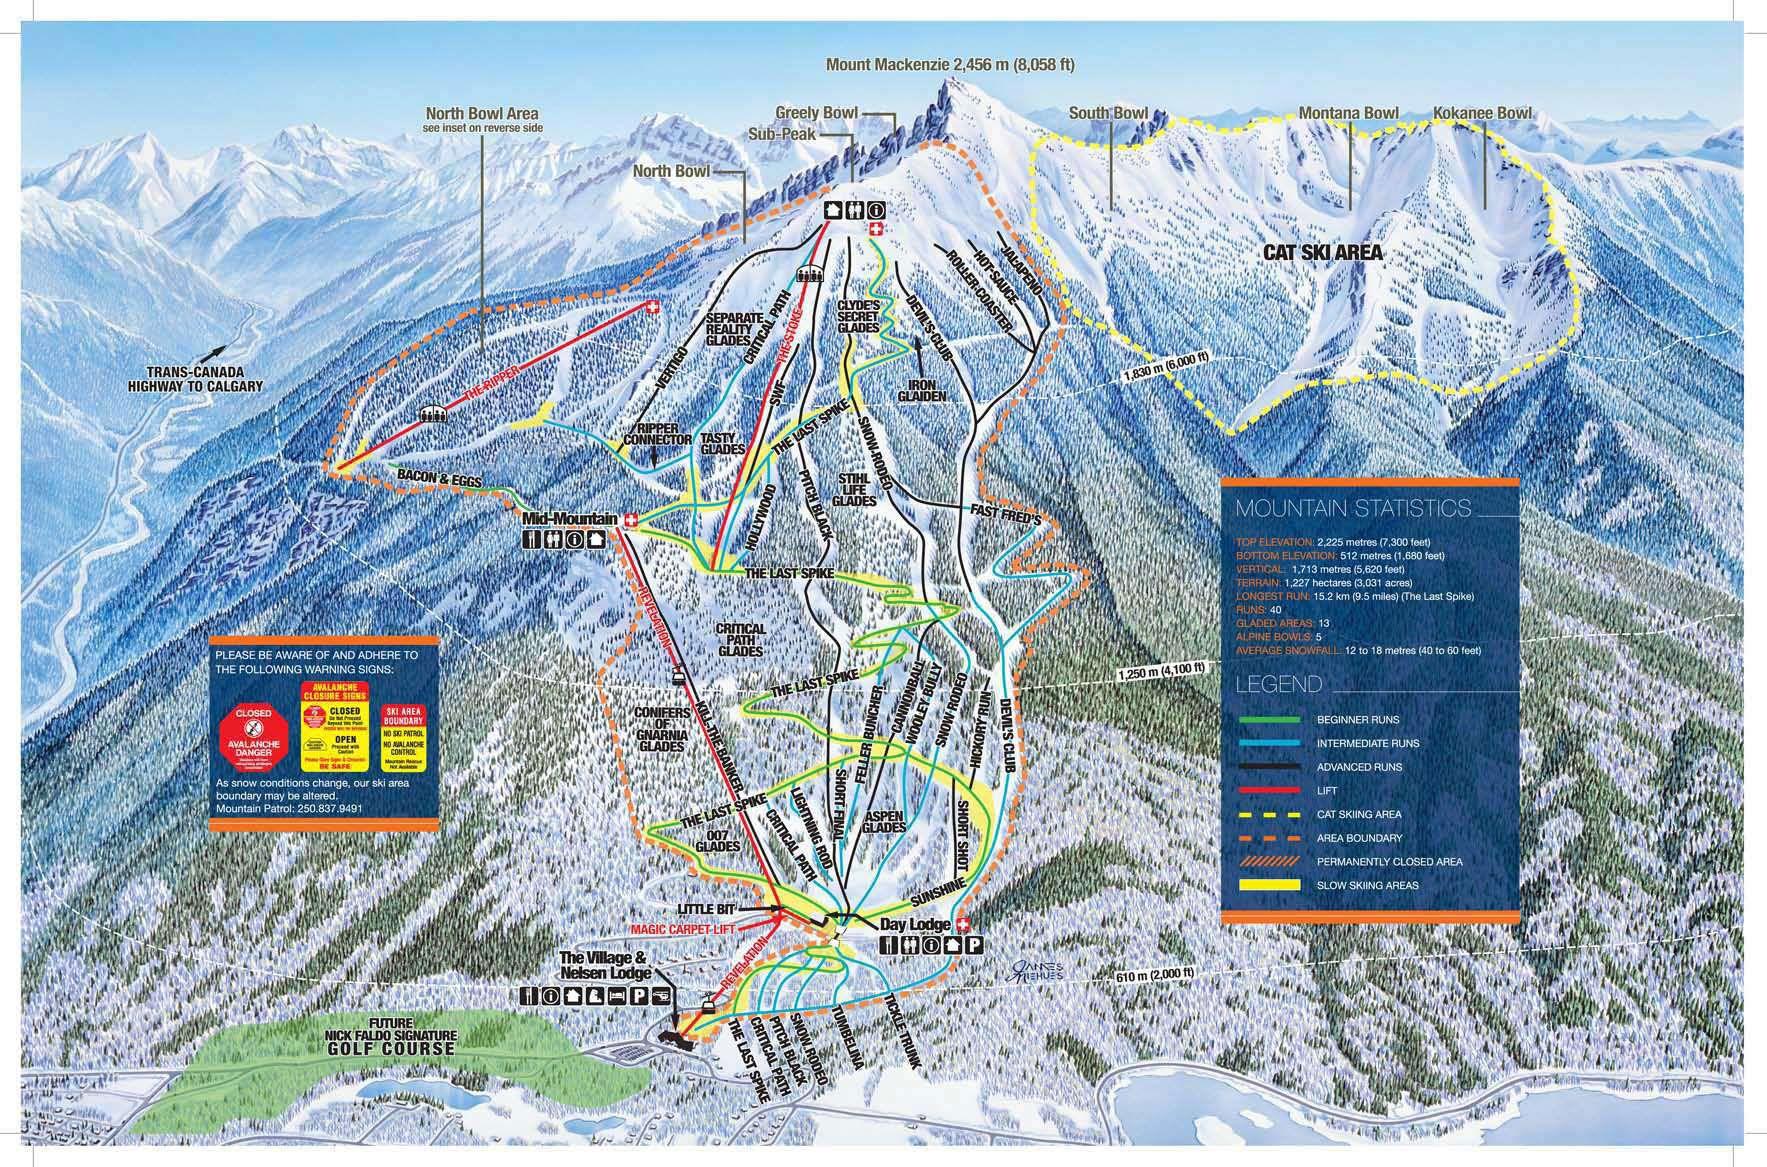 Revelstoke Ski Resort Piste Map Front  Skiing Love skiing  snow